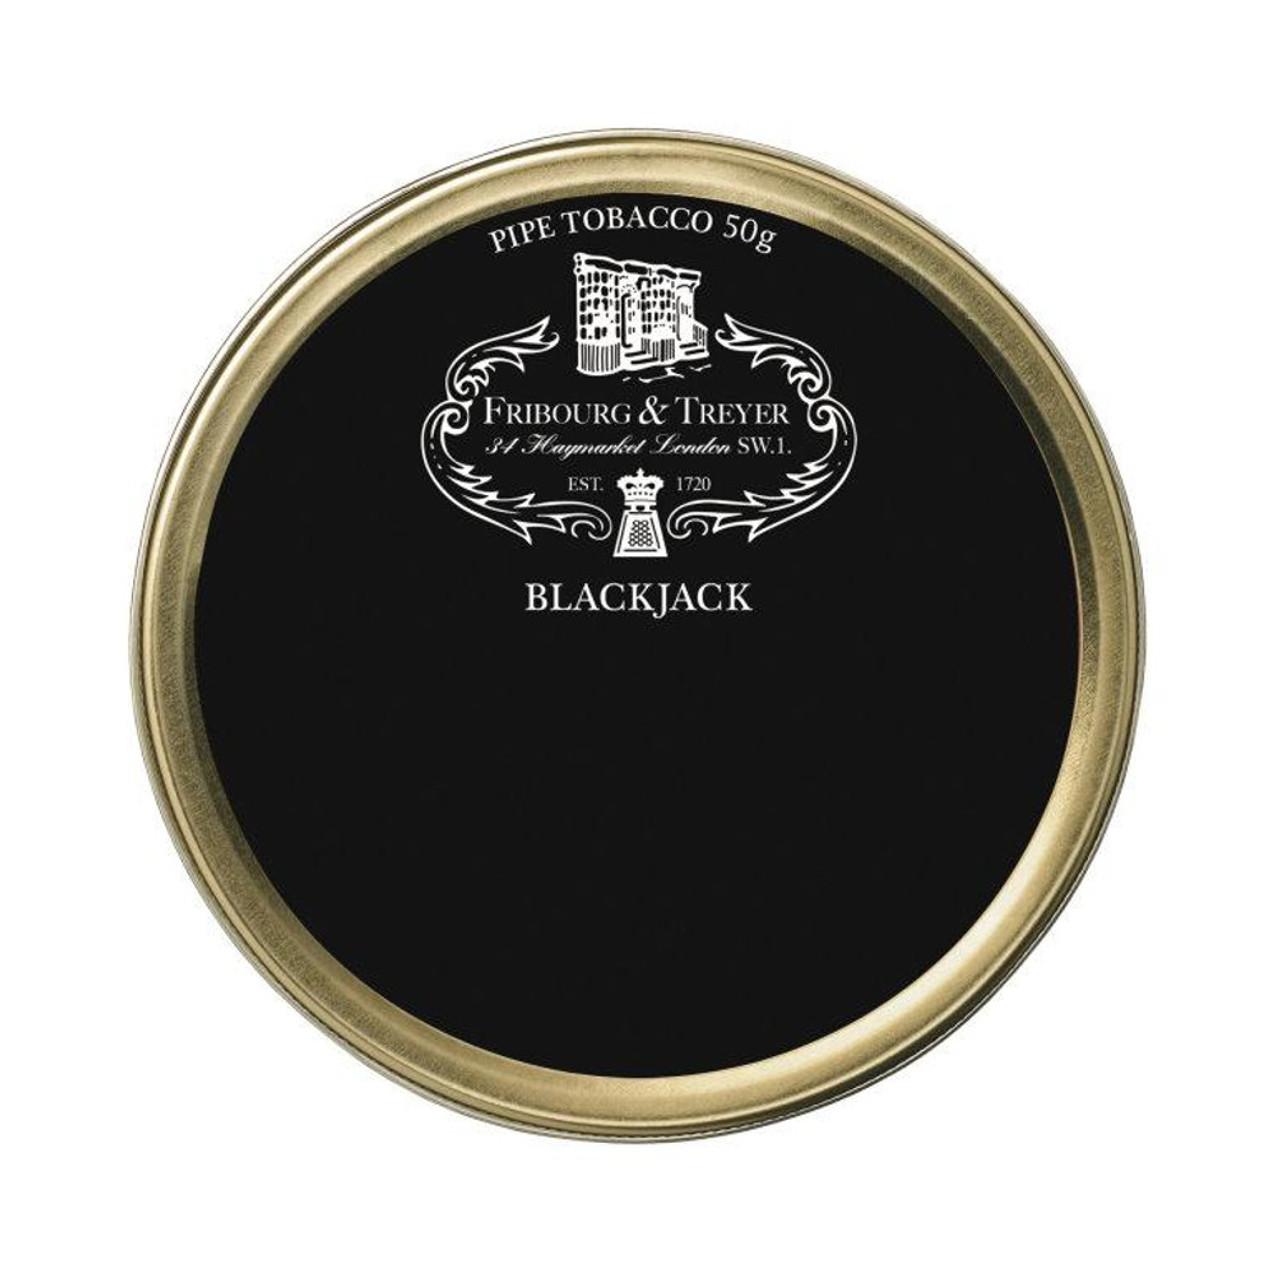 Fribourg & Treyer Blackjack Pipe Tobacco | 1.75 OZ TIN